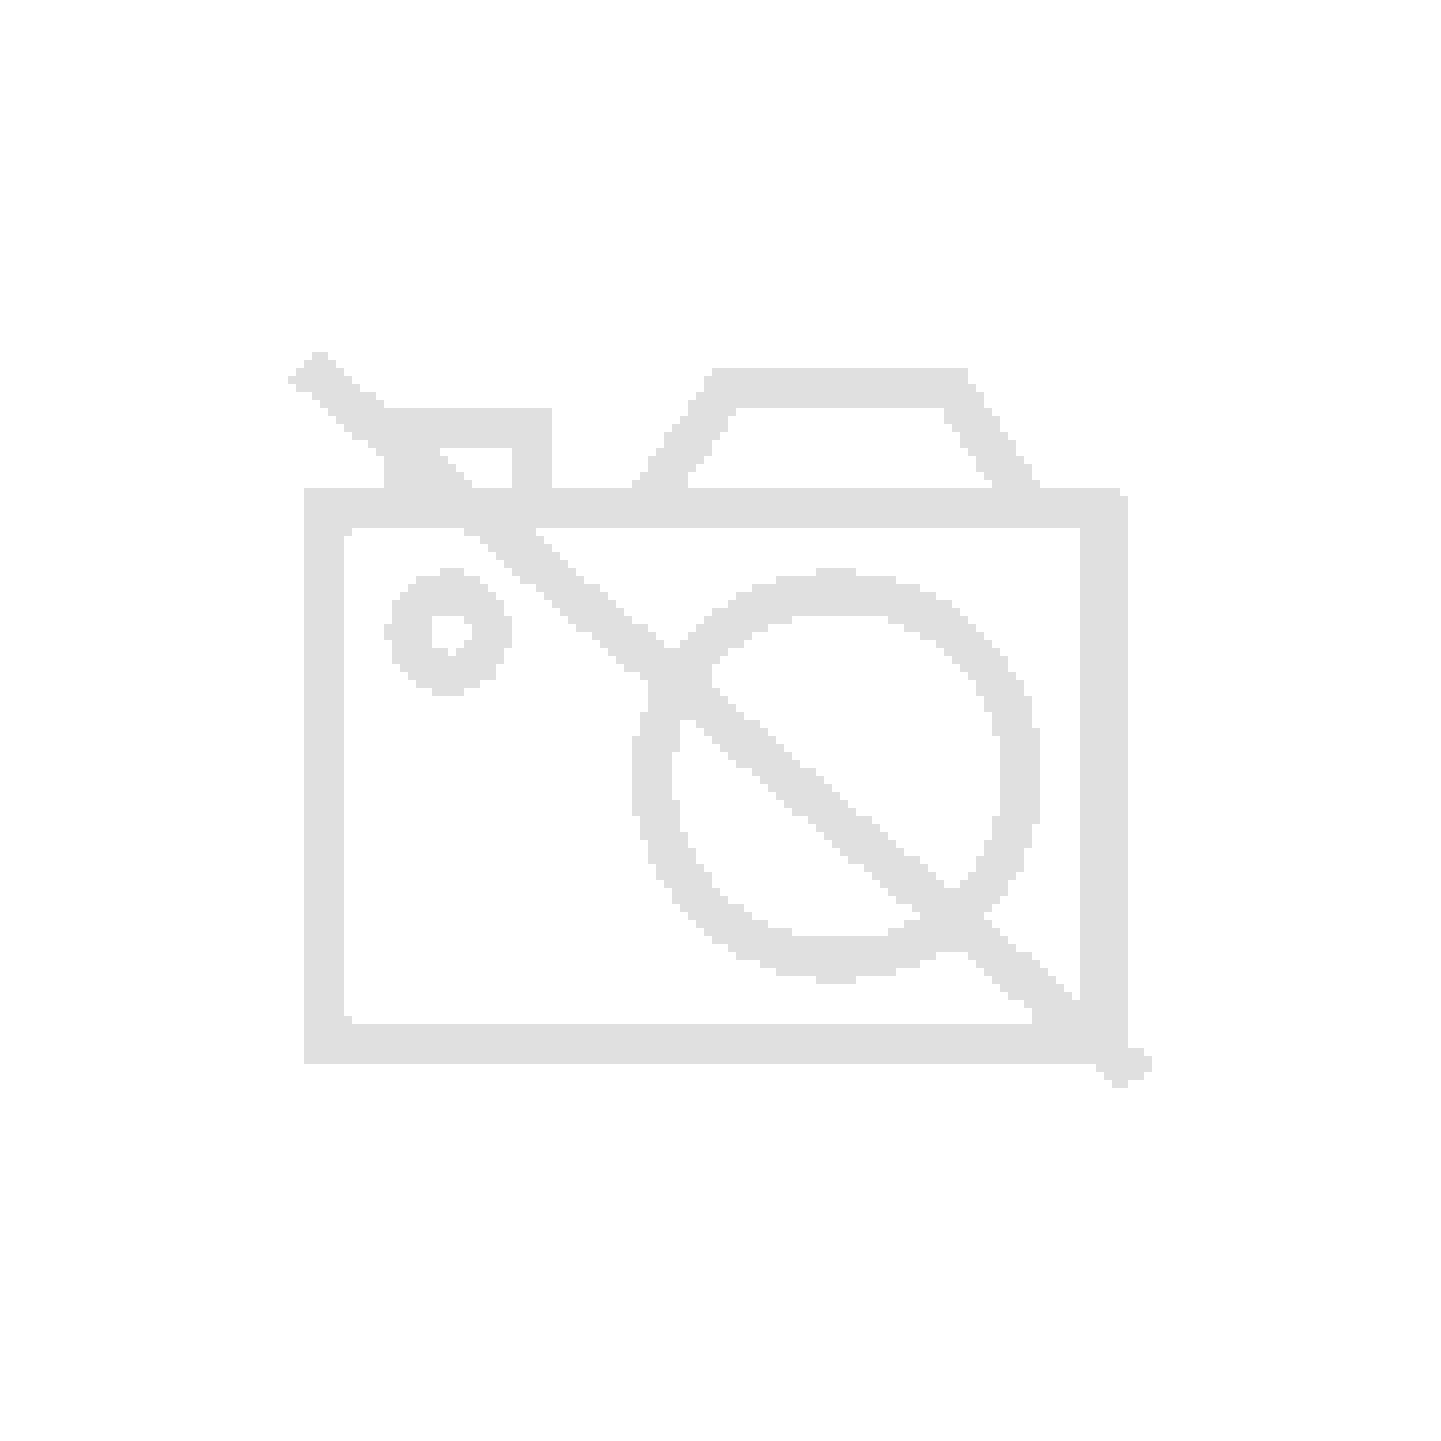 Epson EcoTank ET-4750 Tintenstrahl-Multifunktionsdrucker